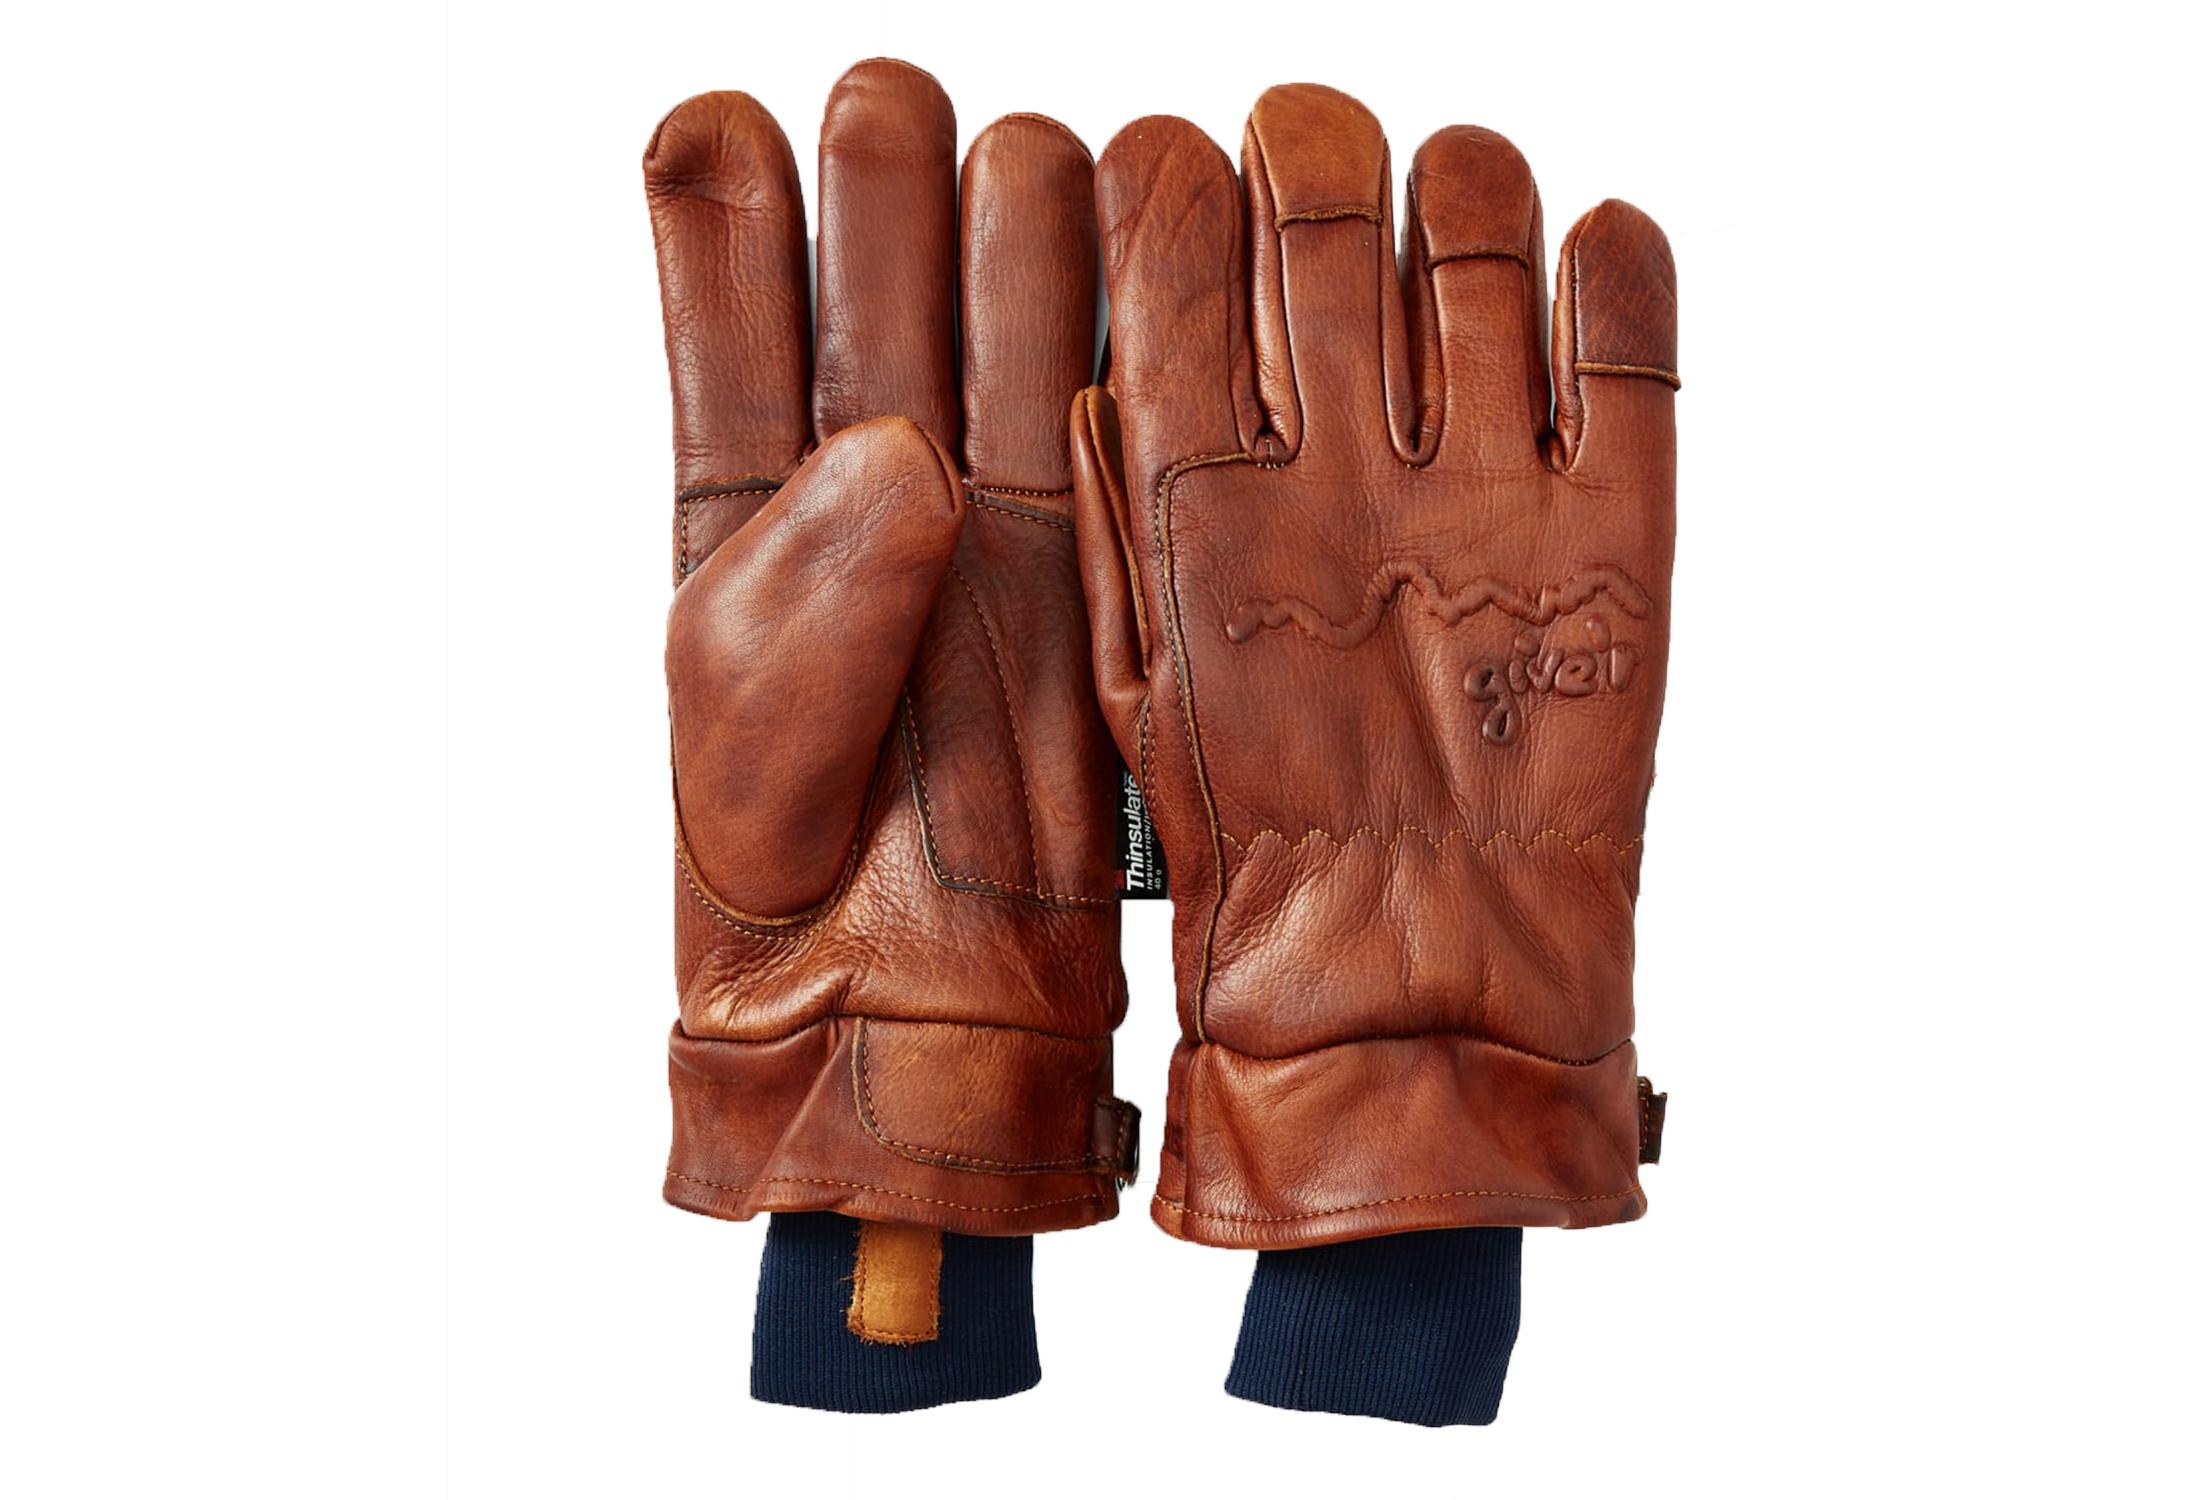 Give'r 4-Season Gloves